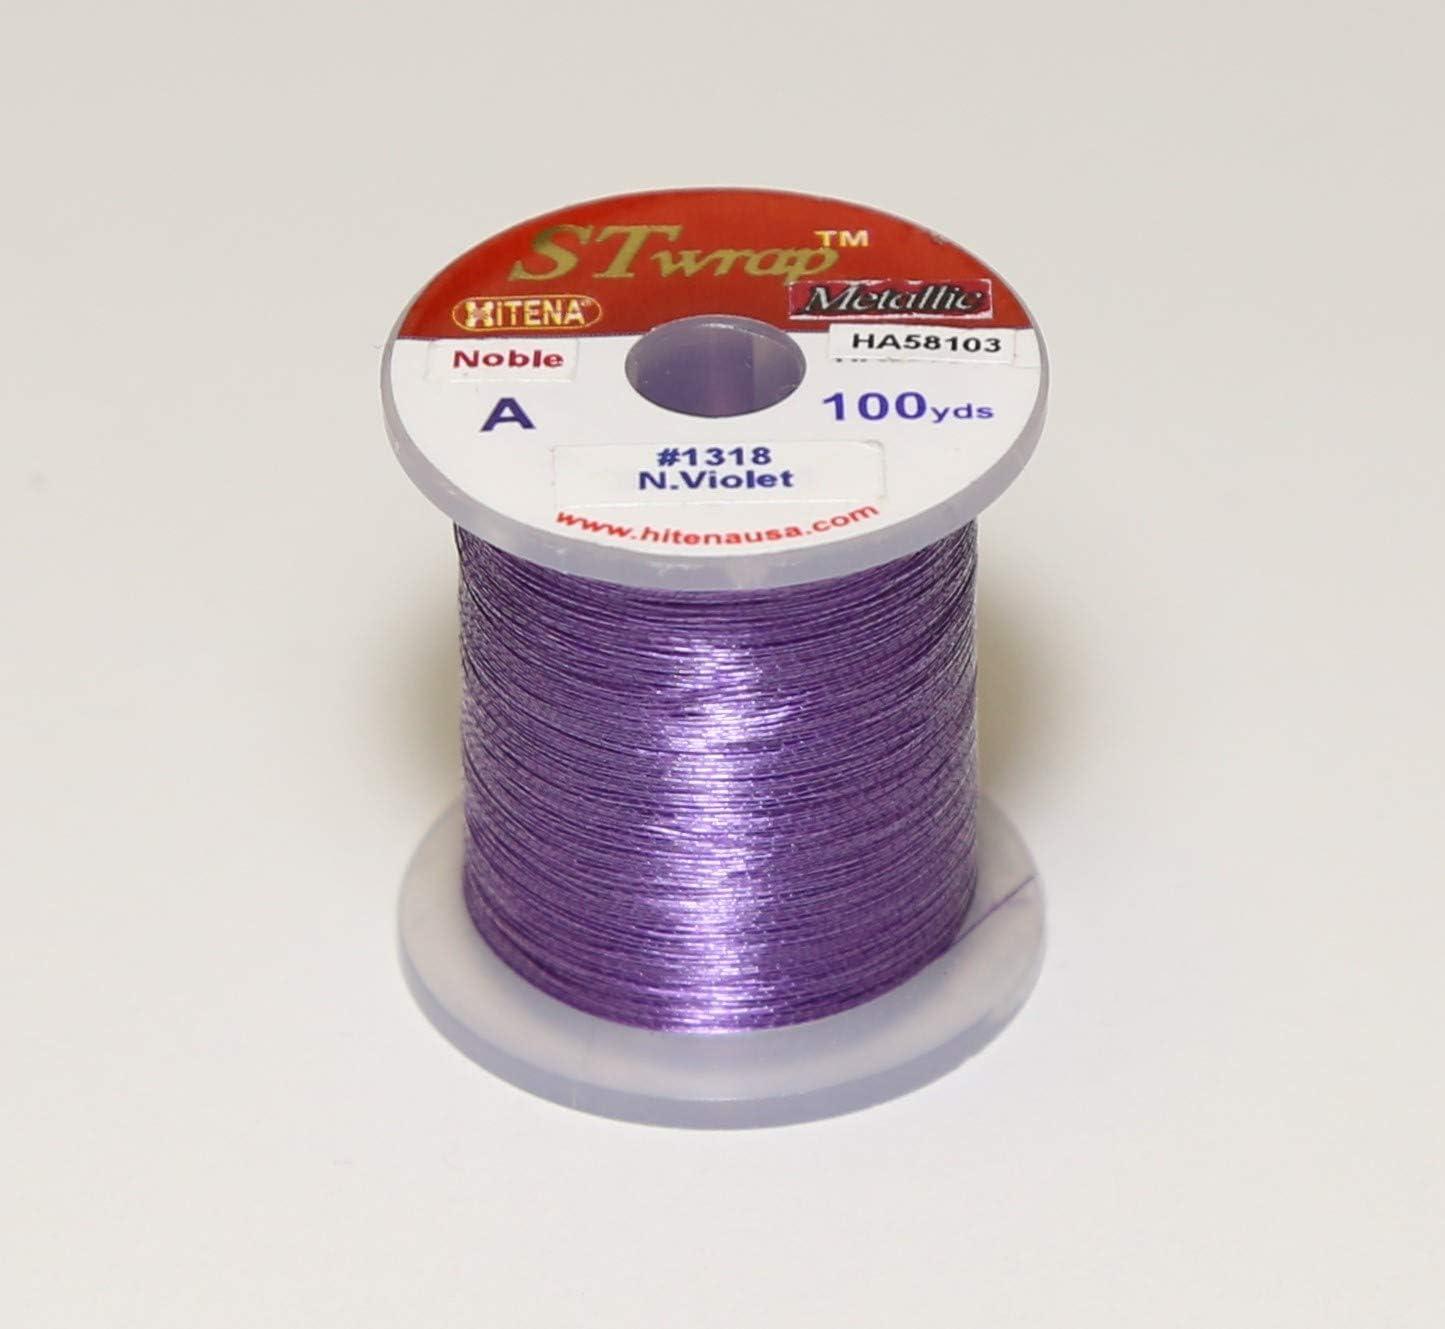 Hitena Free Shipping Cheap Bargain Gift Rod Wrapping Thread - Noble Extr Thread. Winding Max 55% OFF Metallic